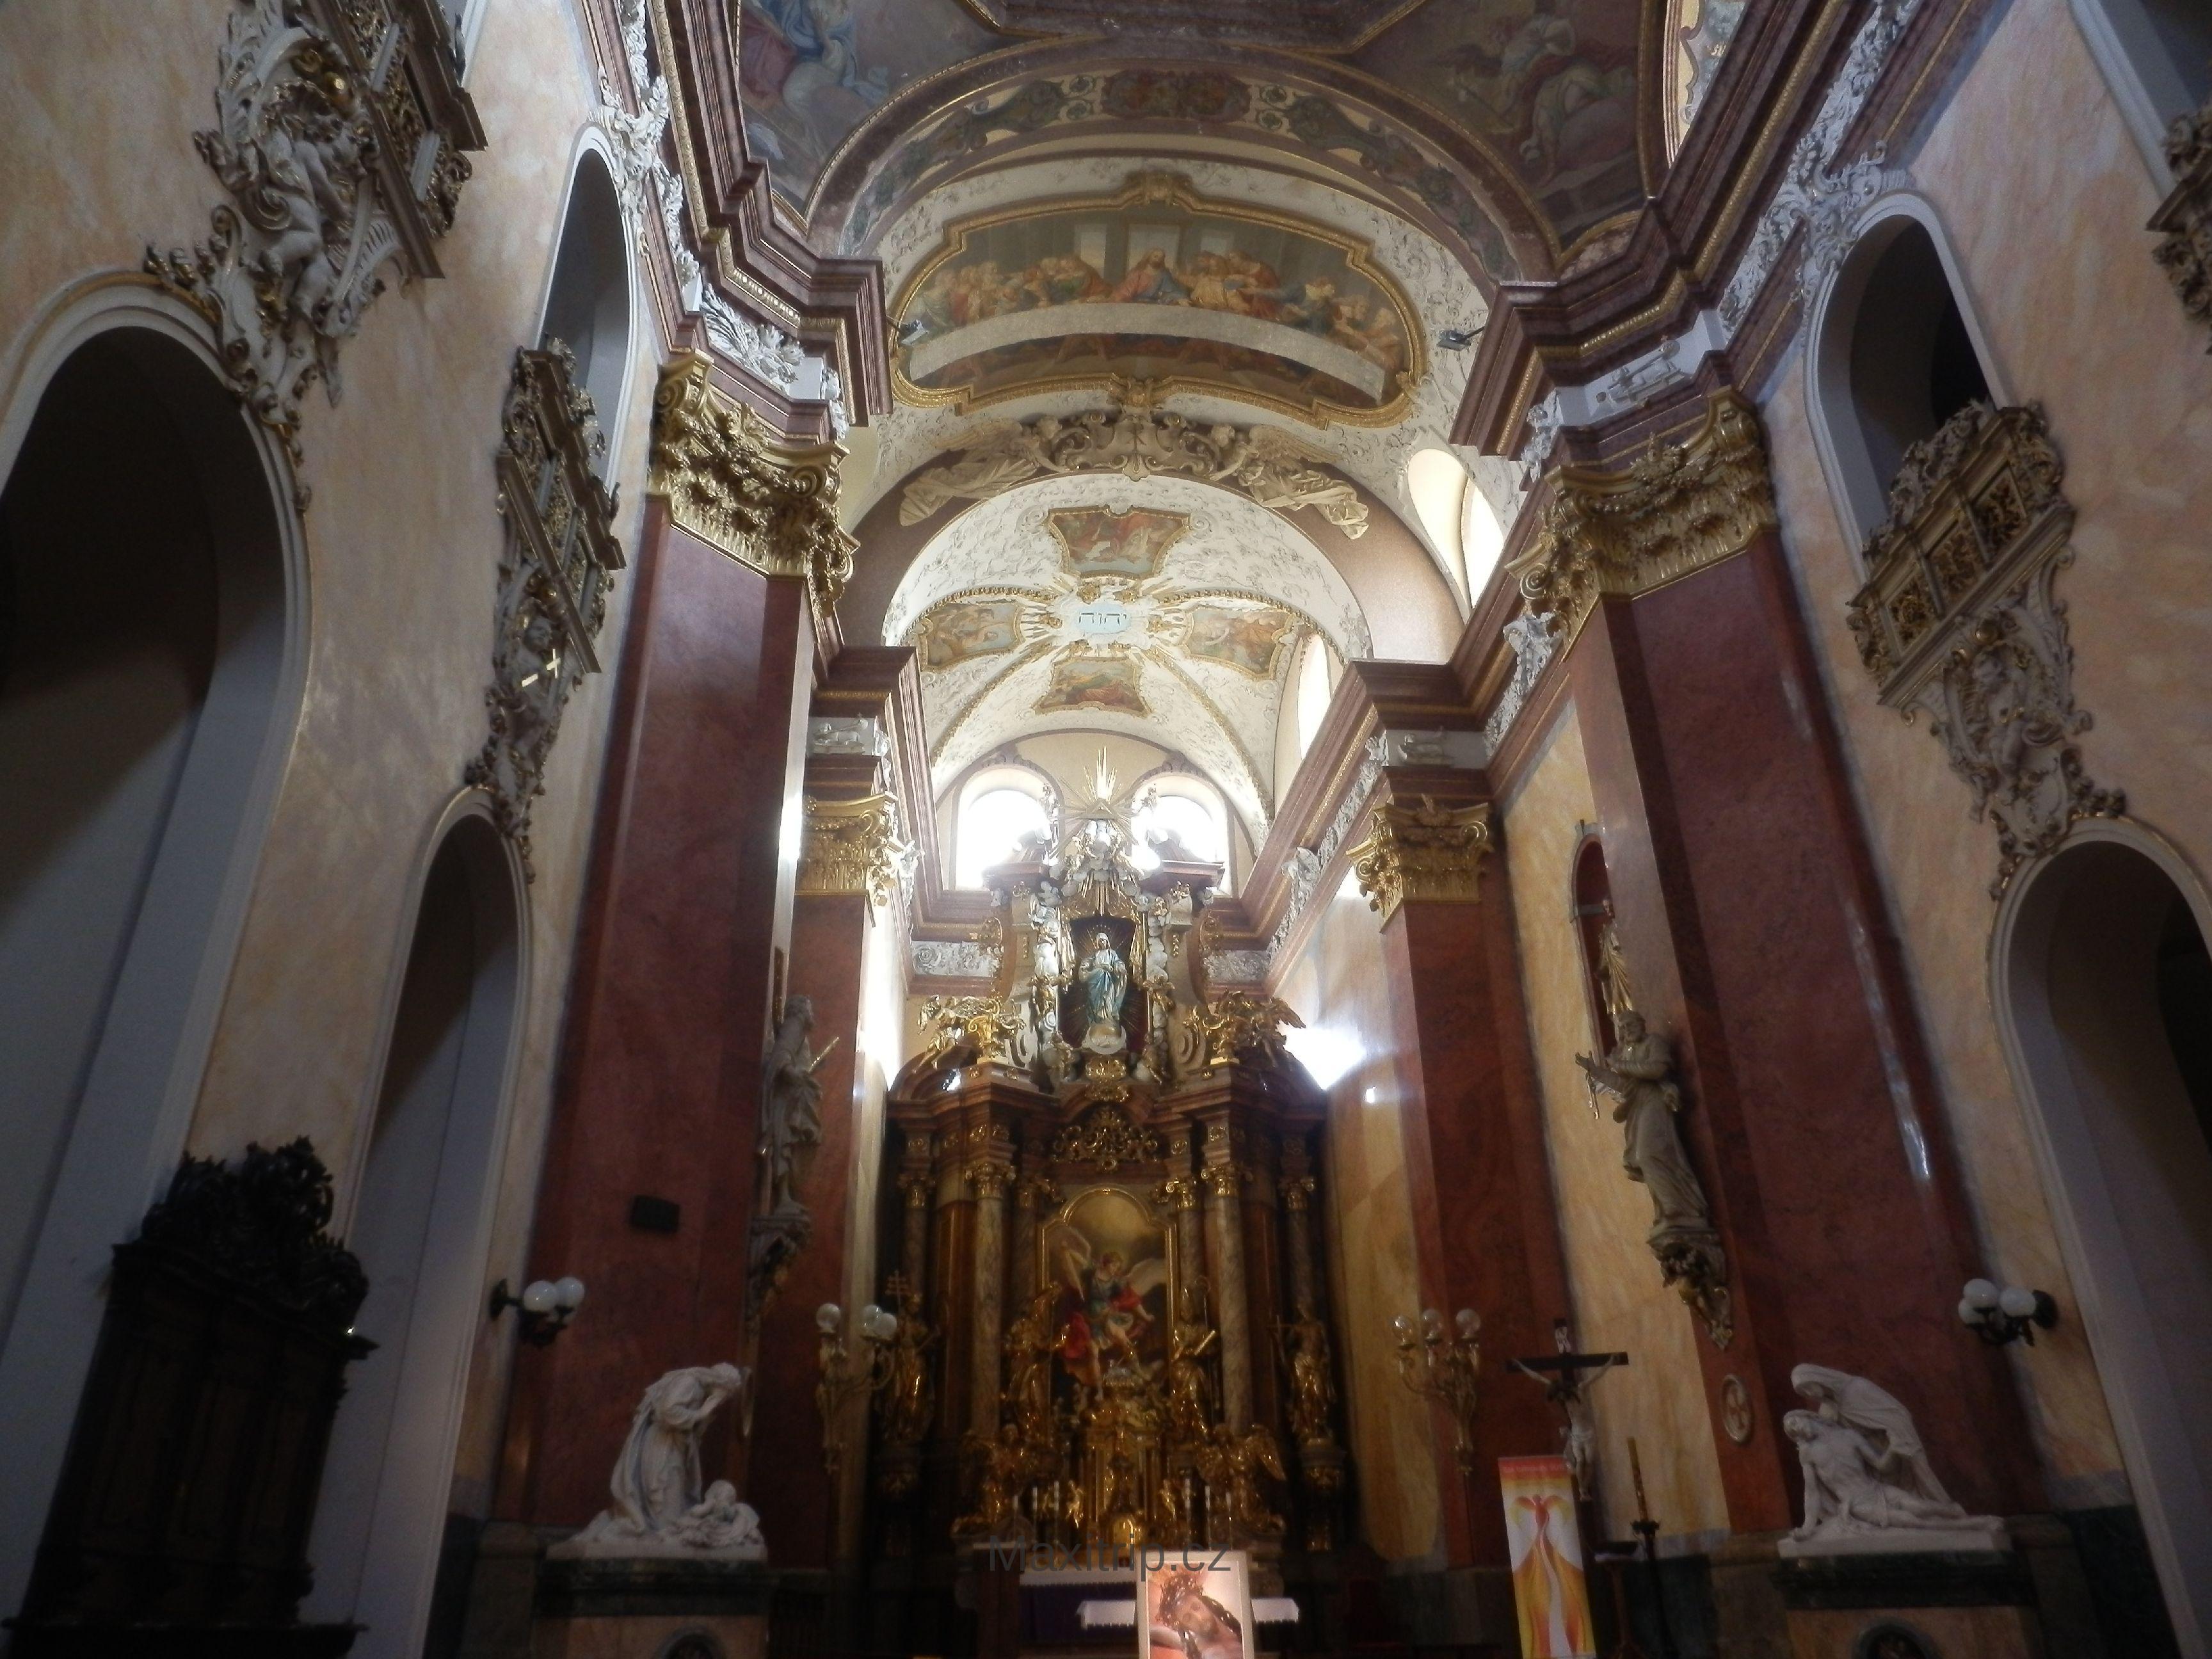 biserica-sf-mihail-din-olomouc-cehia